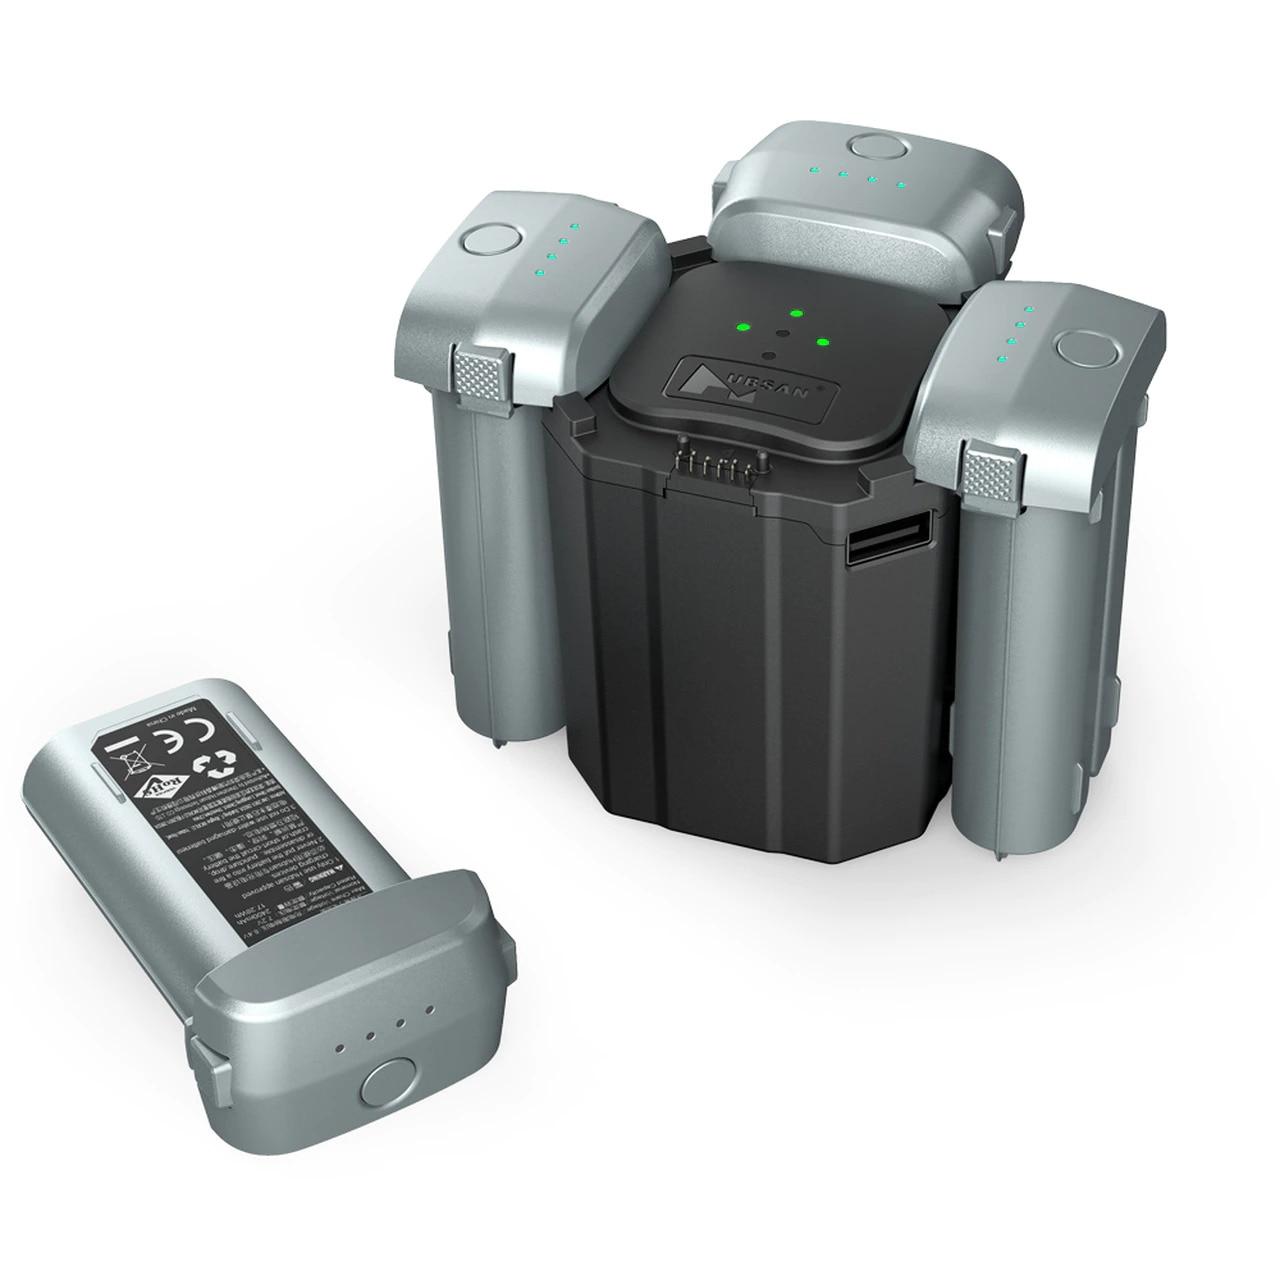 Hubsan Drone ZINO Mini PRO 249g GPS 10KM FPV 4K 30fps Camera 3-Axis Gimbal RC Quadcopter Discounts Code: LF15AS5OAPT5 6